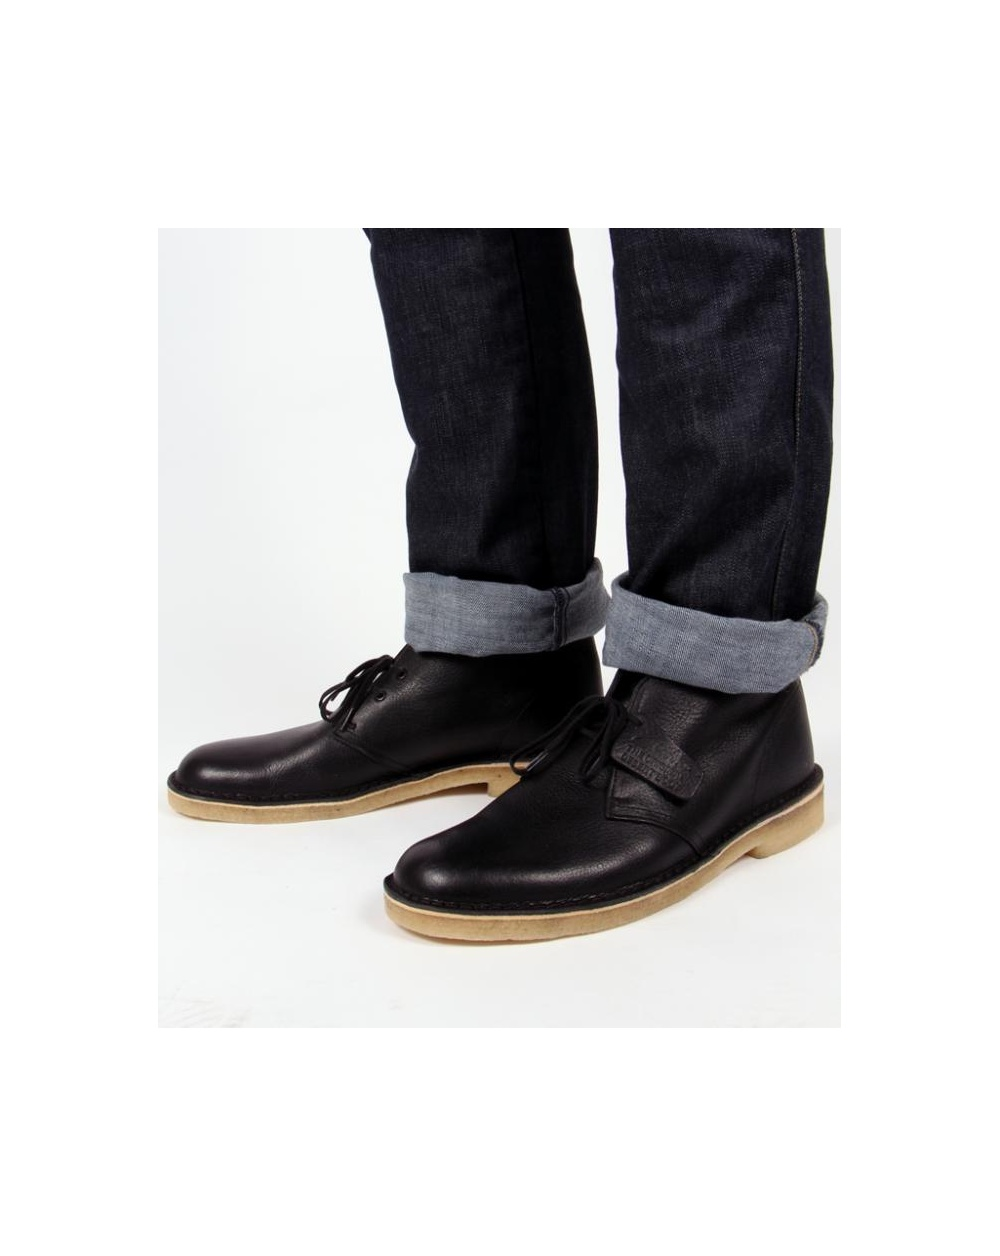 Desert In Originals Black Boot Clarks Leather 5gqPx0fw